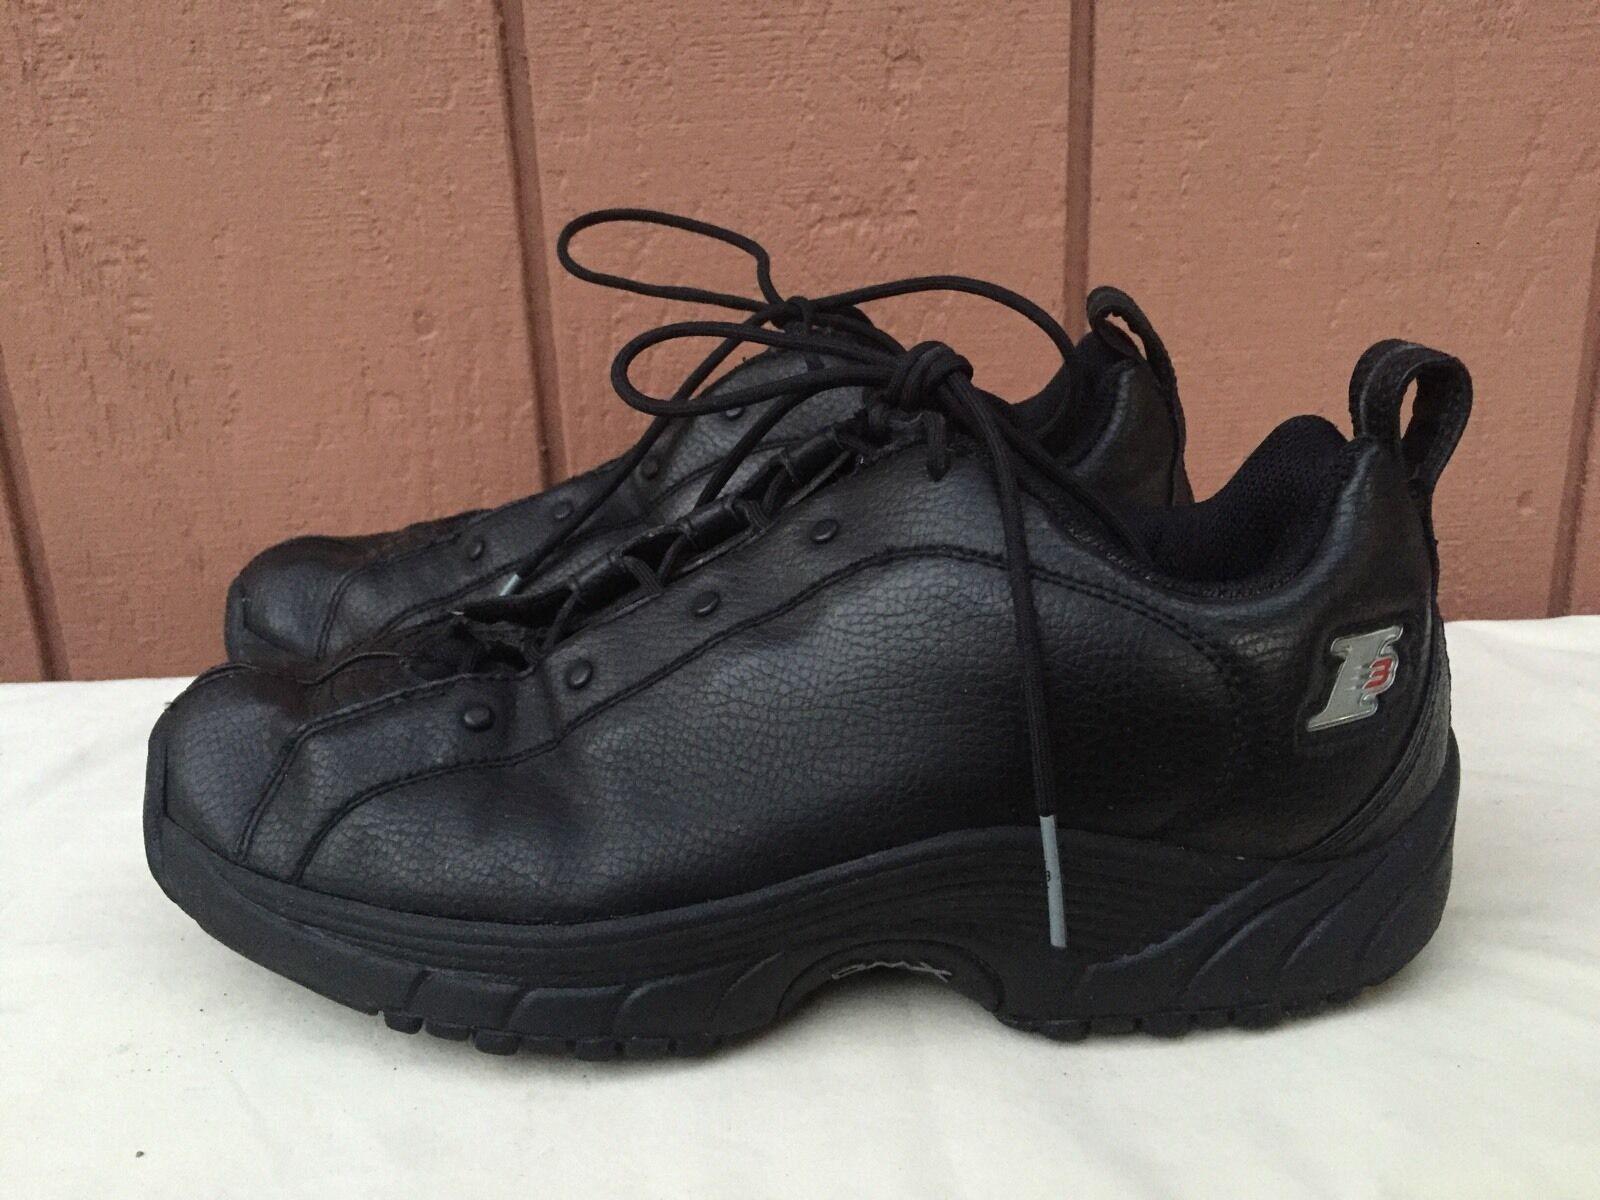 Excelente condición usada poco común REEBOK 2001 Vintage I3 Negro Zapatillas Allen Iverson Playoff para Hombre US 8